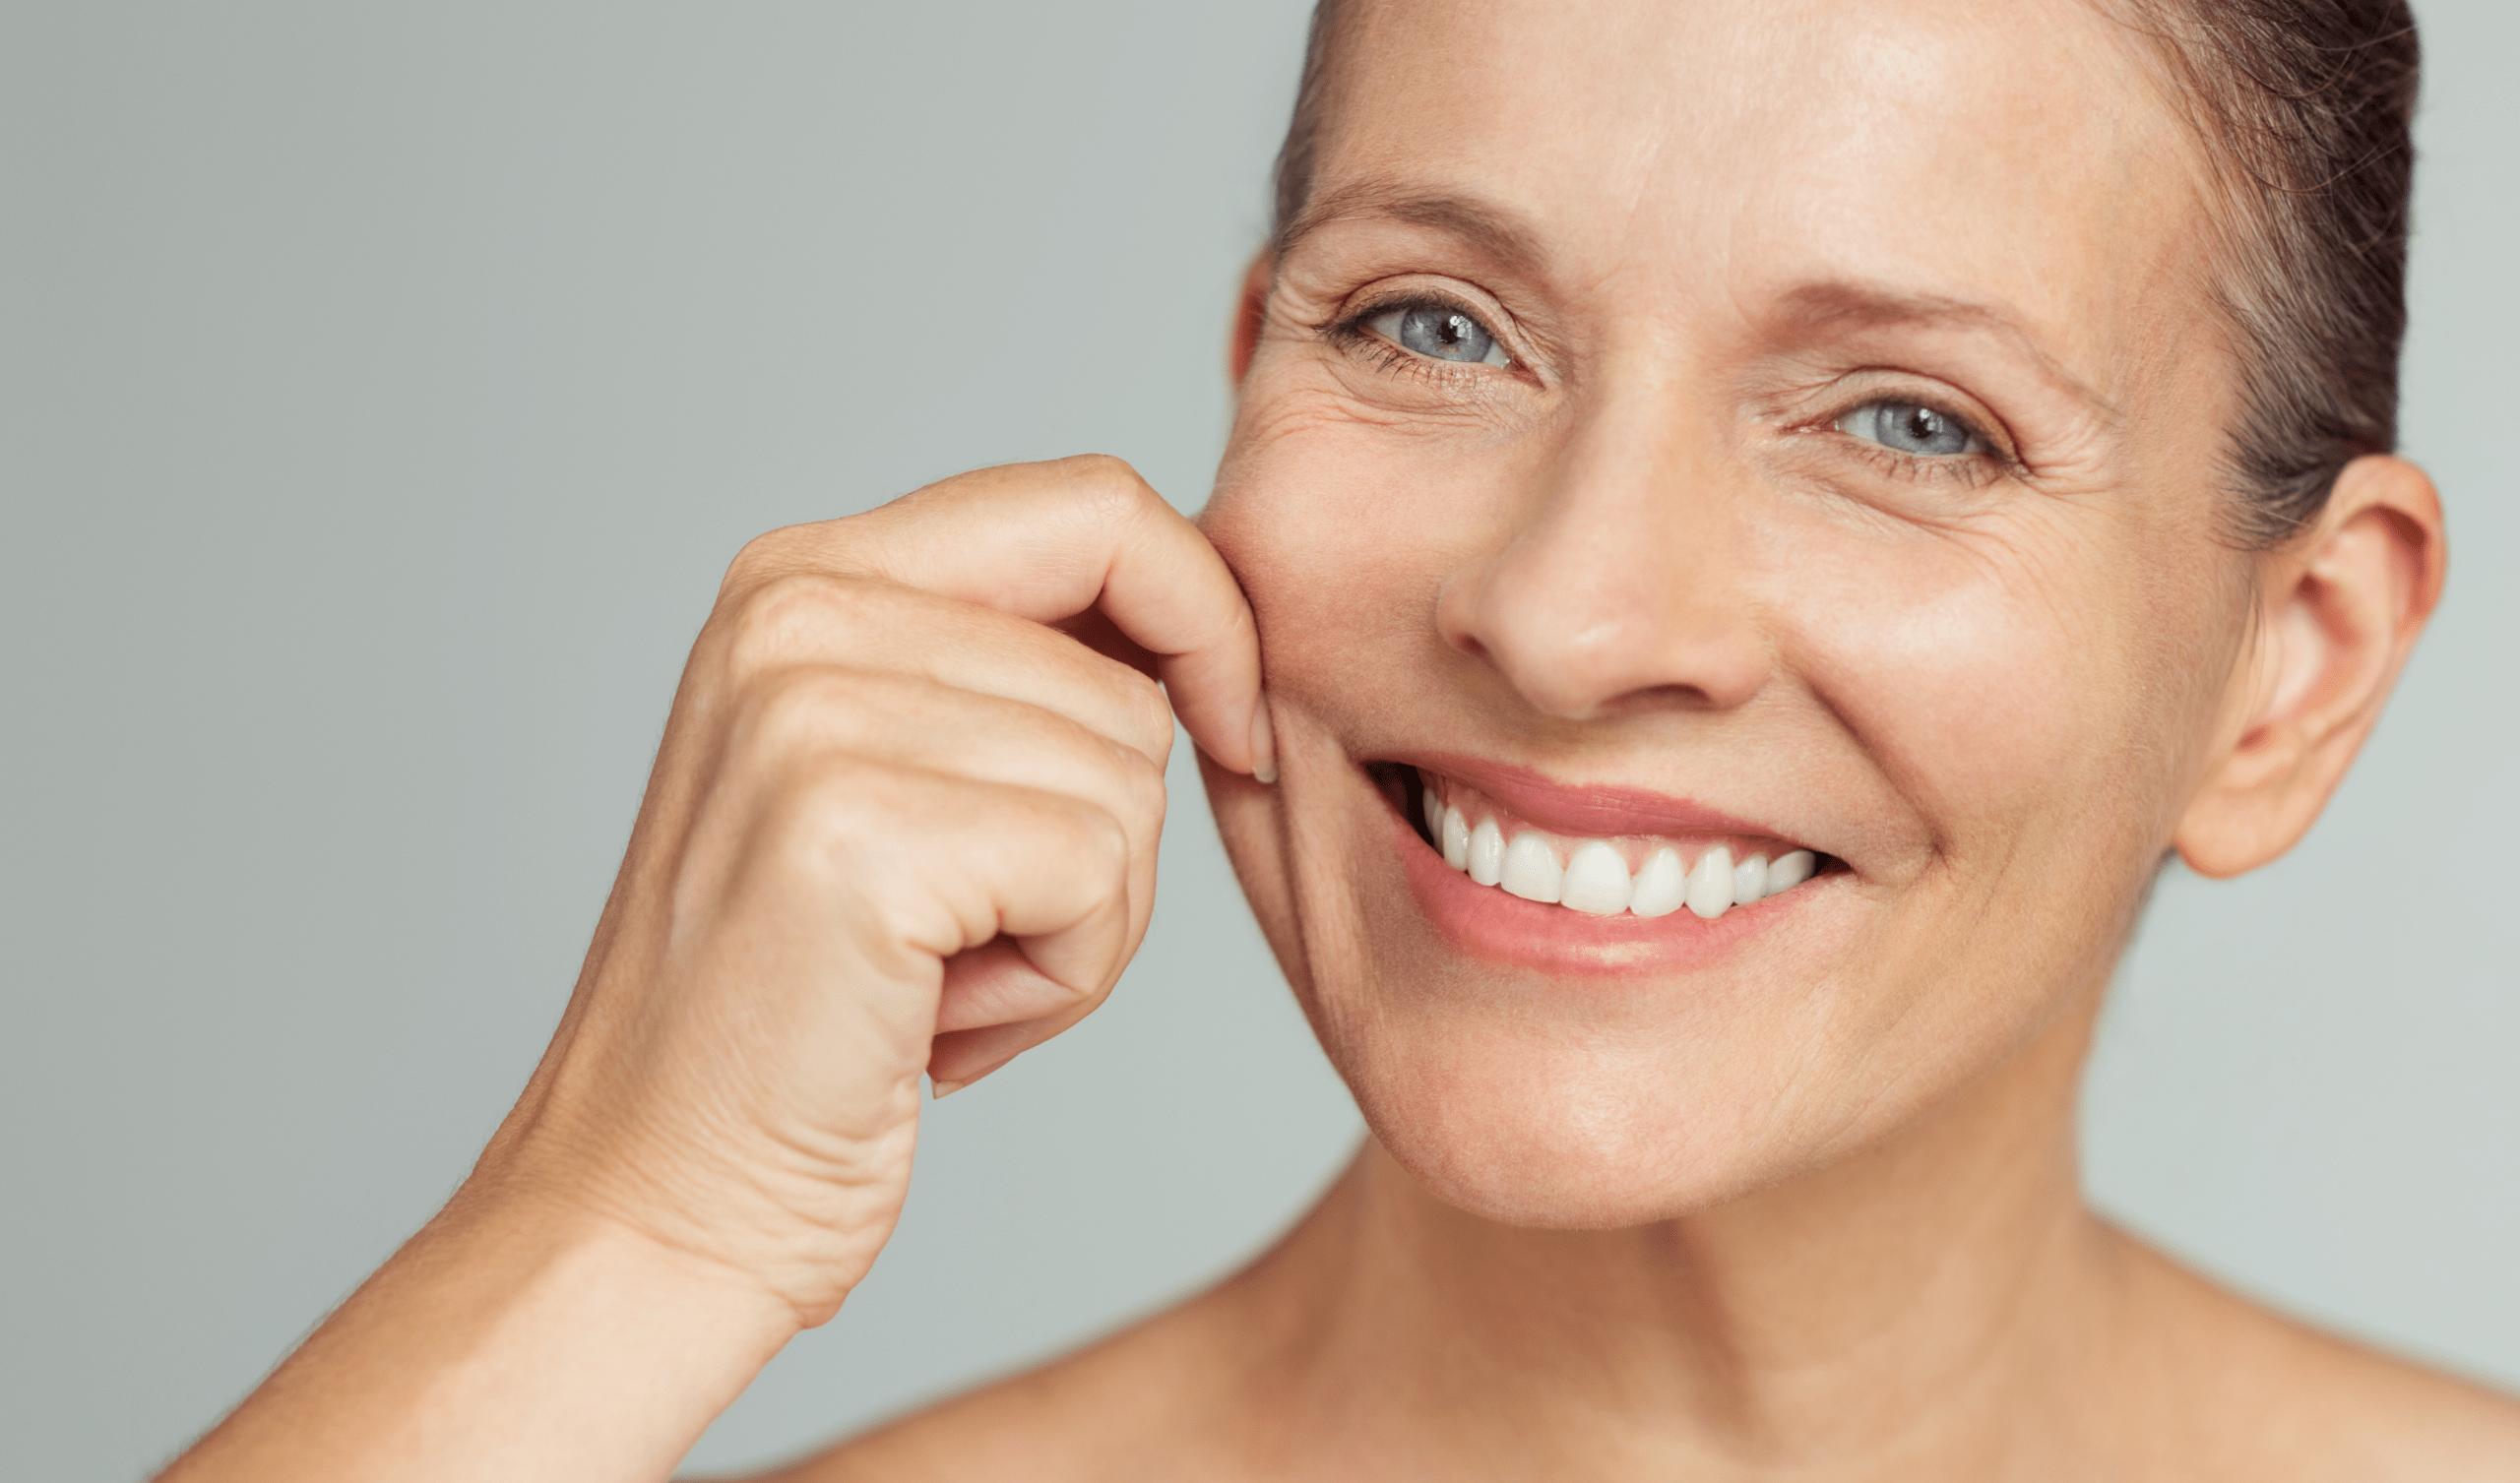 Dermal Filler for facial volume loss